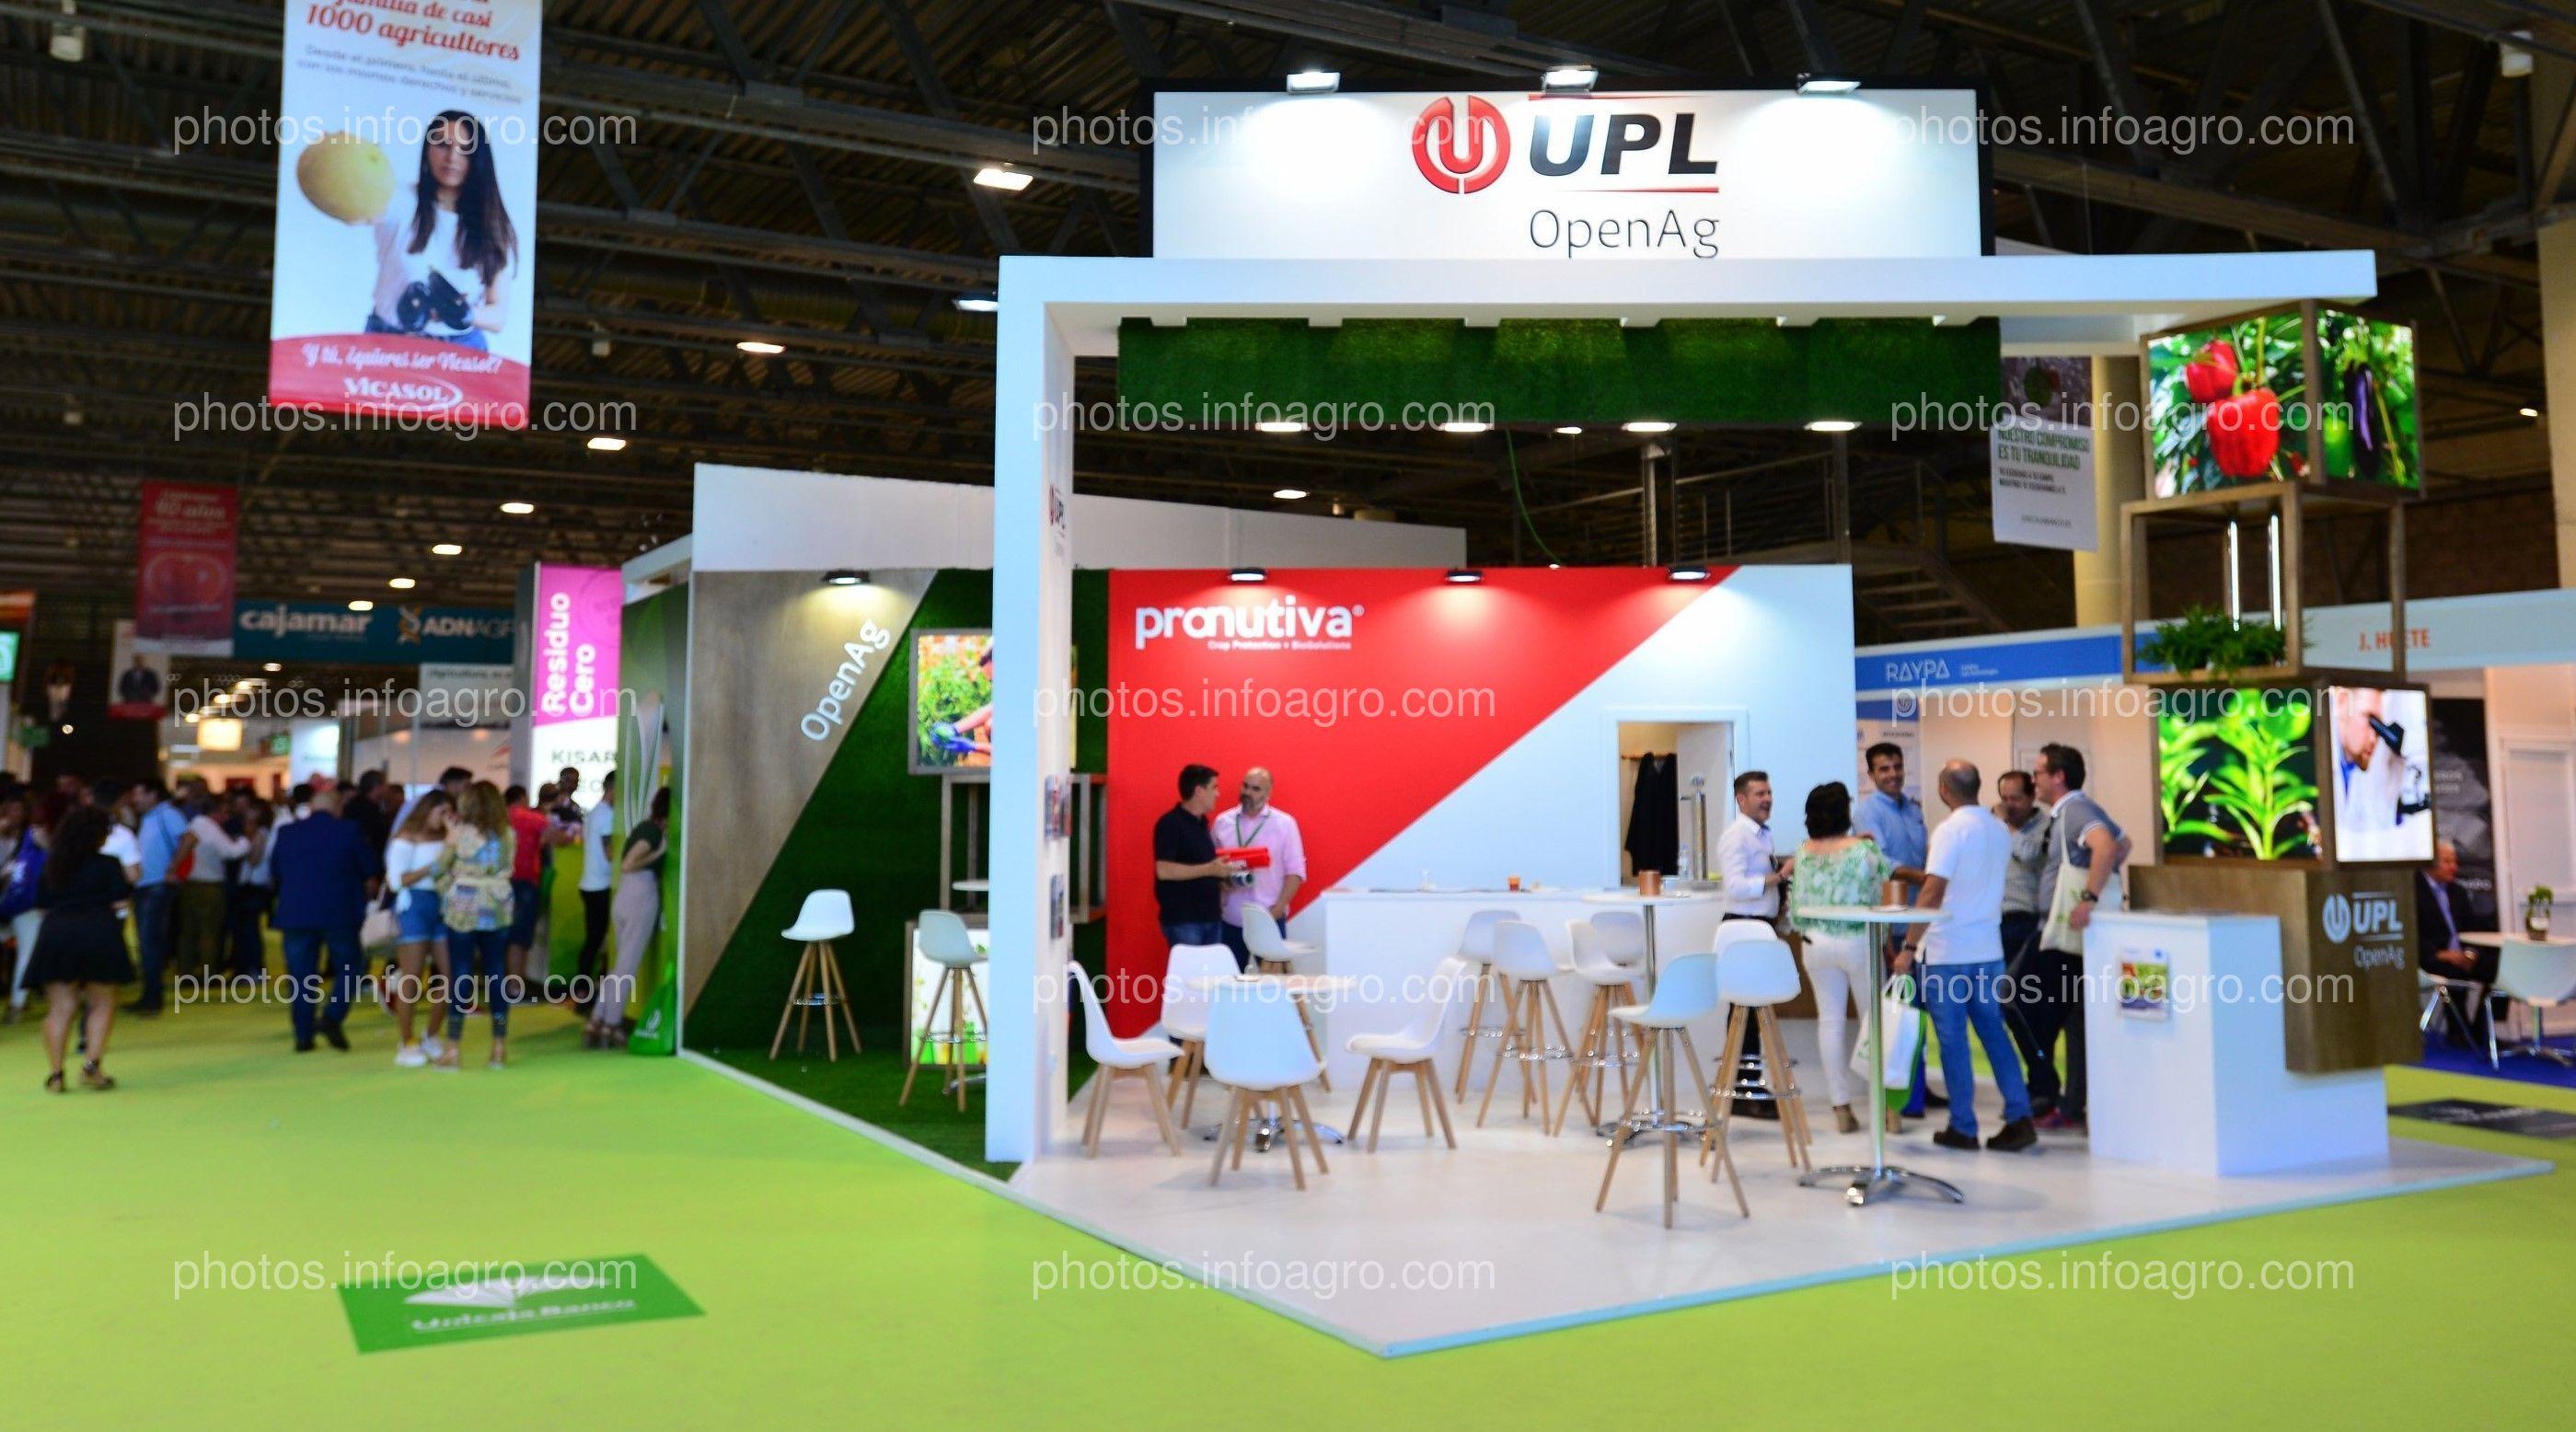 UPL - Stand Infoagro Exhibition